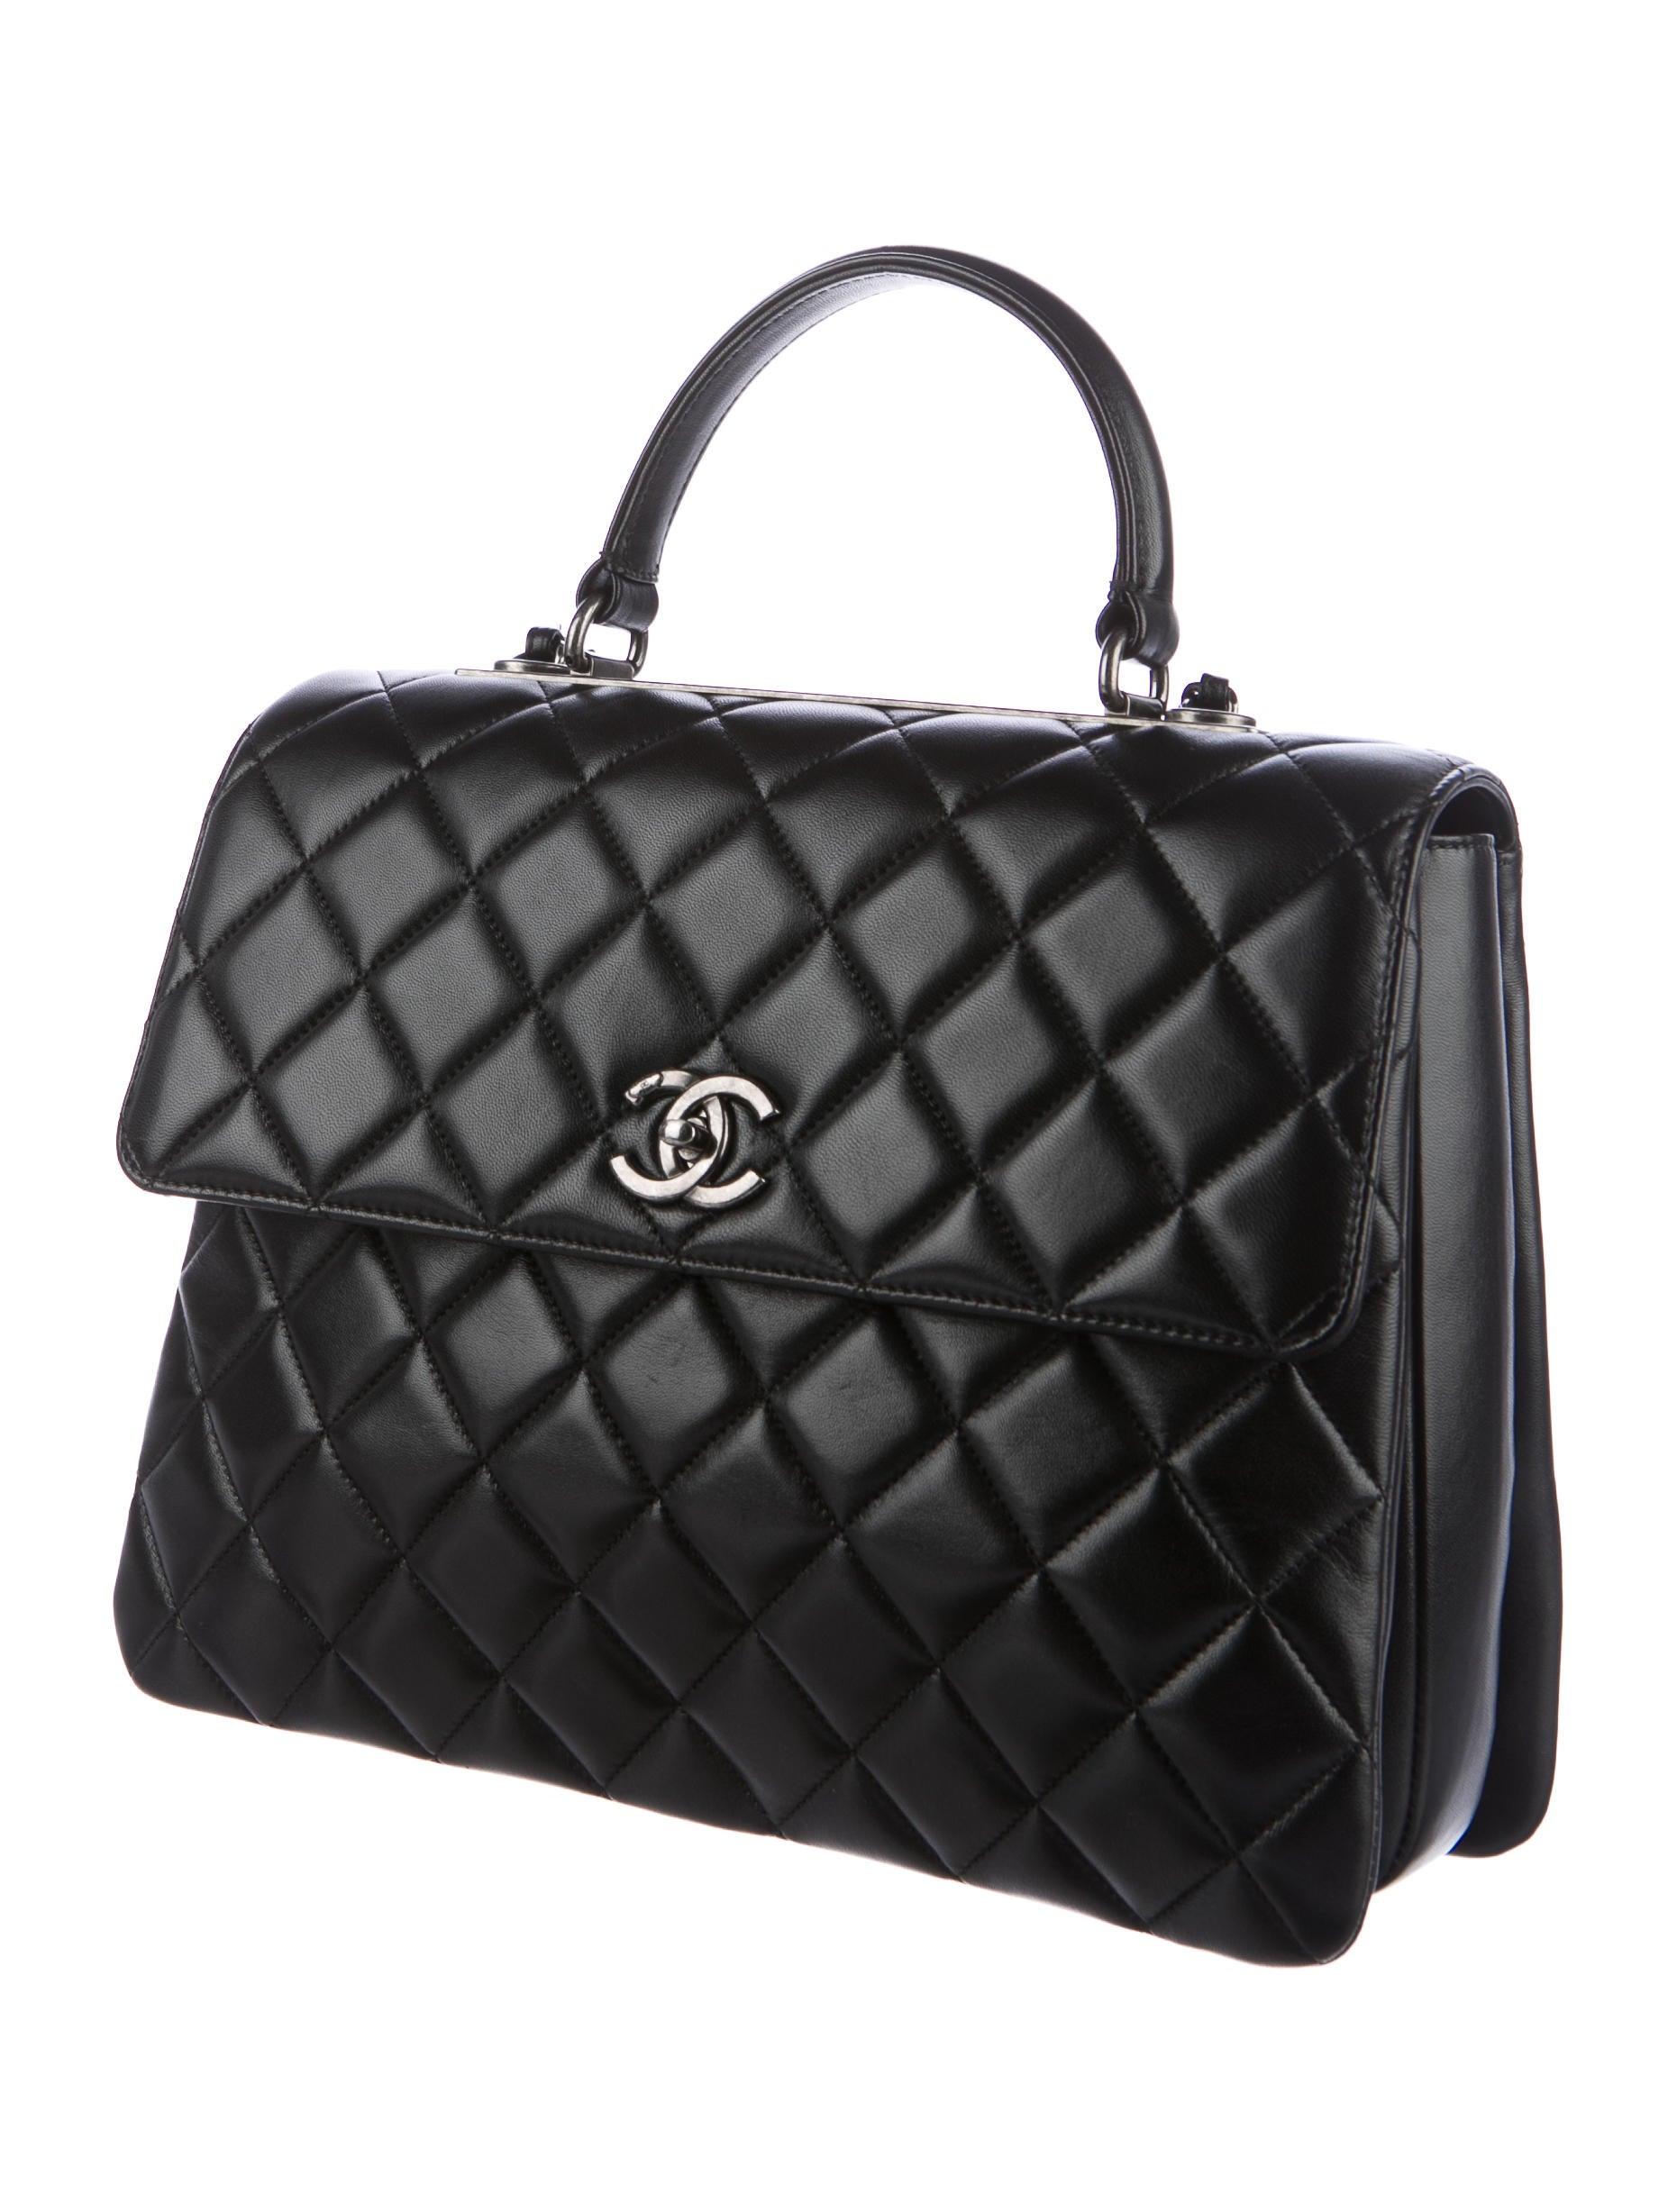 Chanel 2016 Trendy CC Large Flap Bag